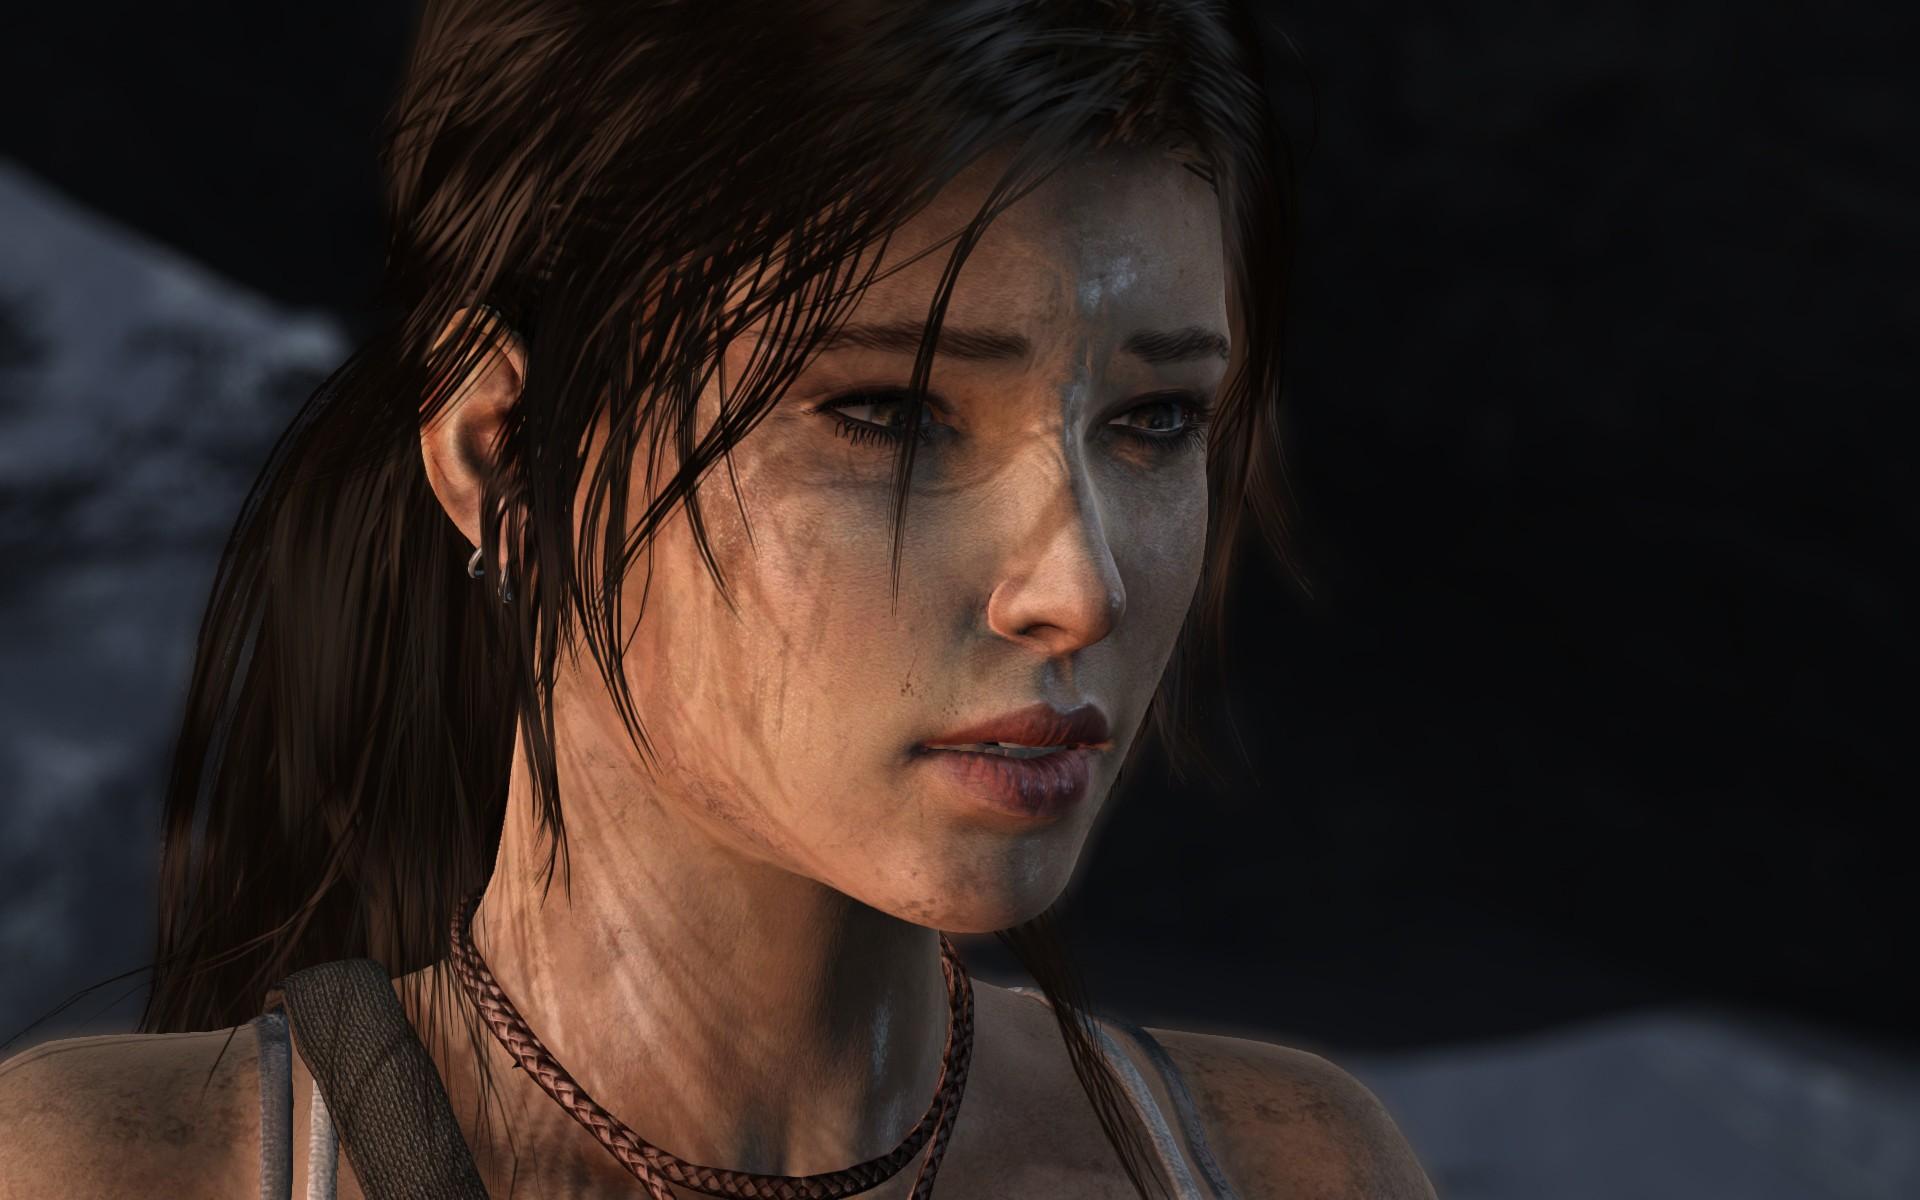 Wallpaper Face Video Games Model Portrait Fashion Lara